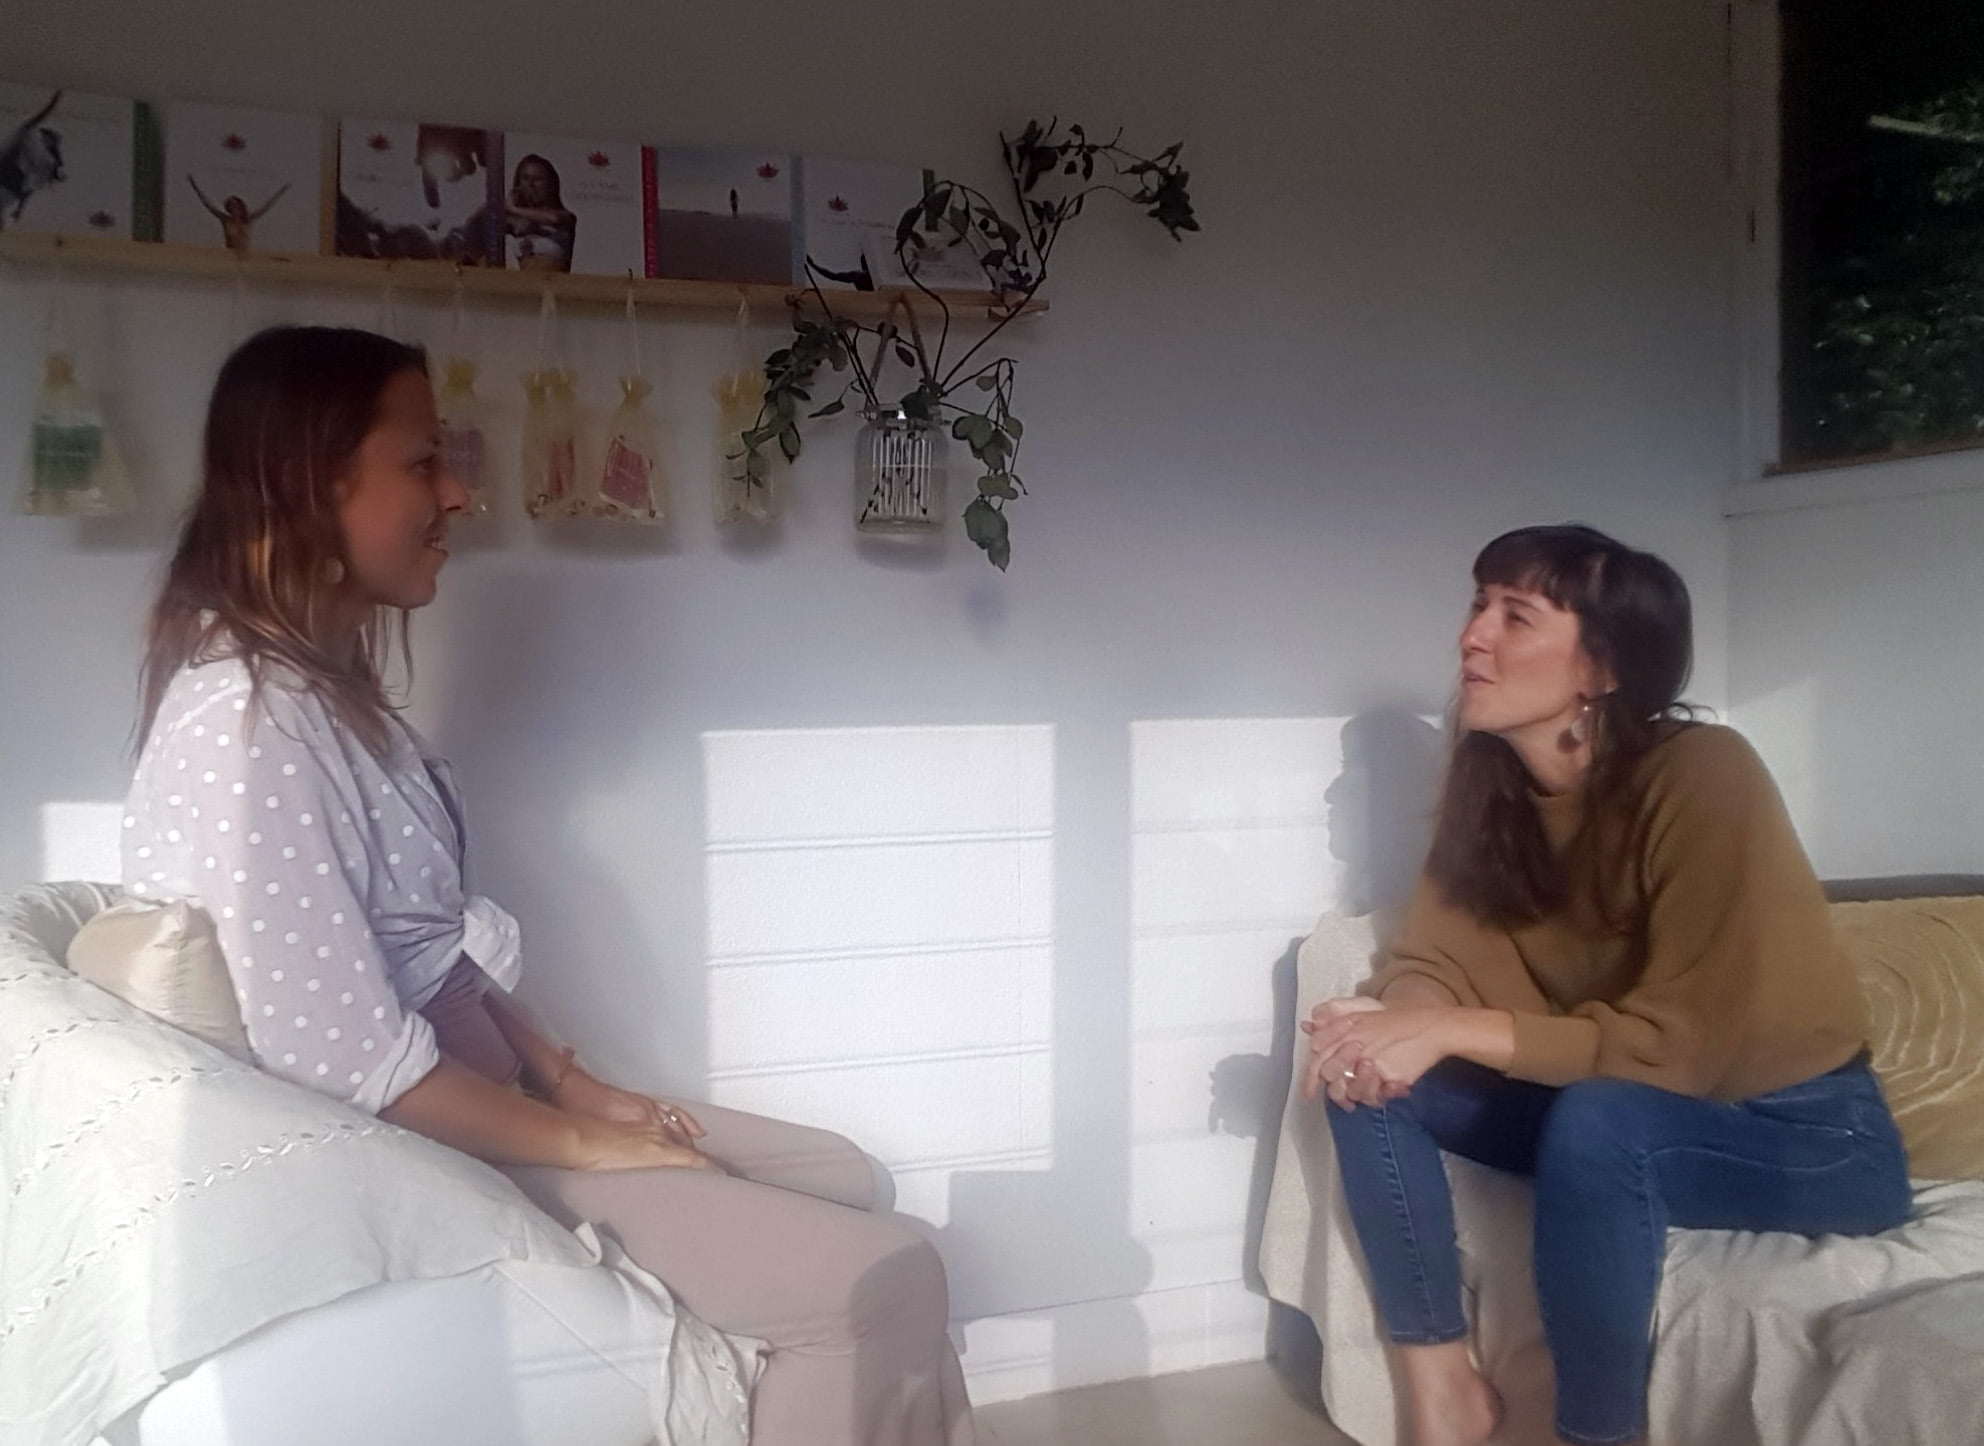 Somatic (Body) Psychotherapy with Izabella Siodmak